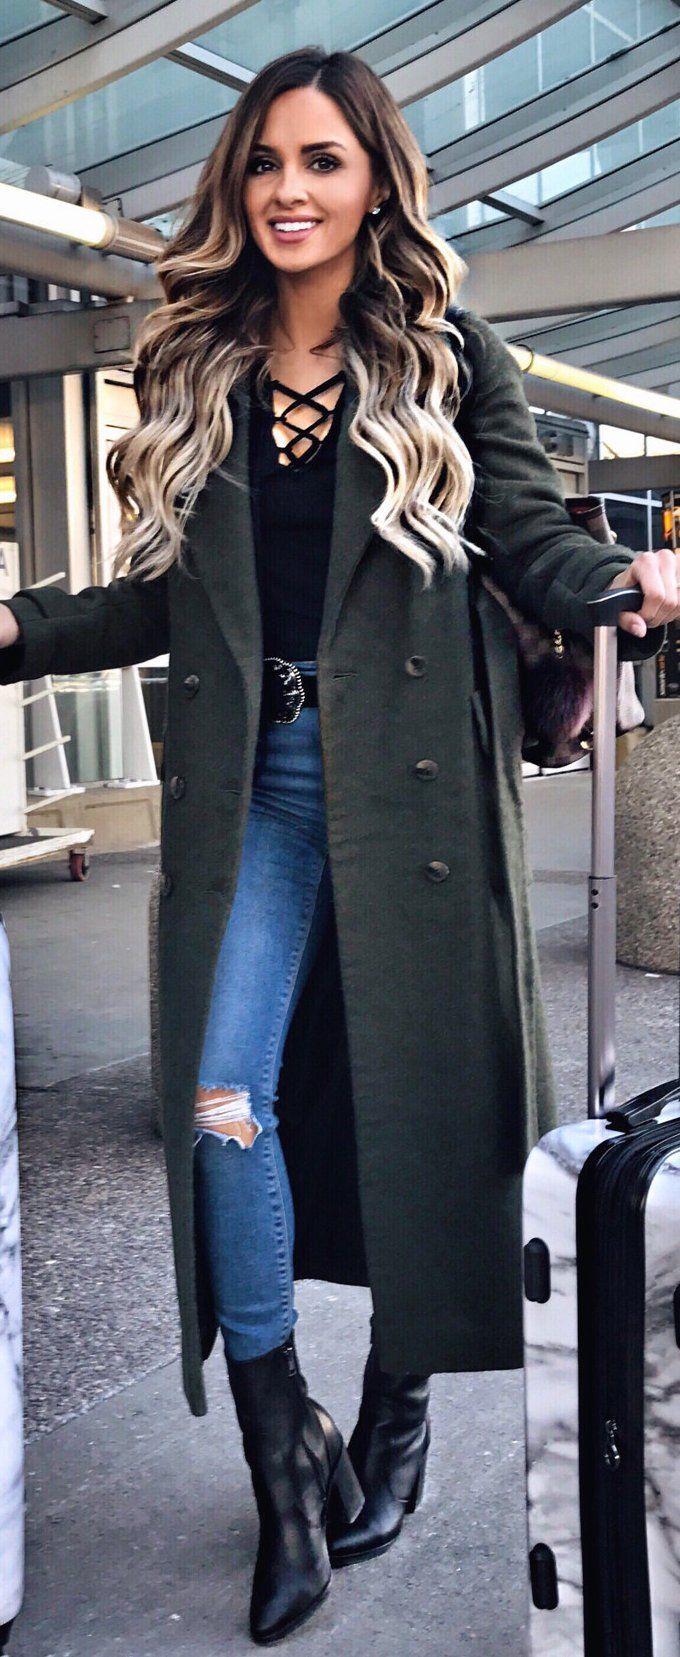 how-to-style-blue-med-skinny-jeans-black-tee-belt-hairr-green-dark-jacket-coat-black-shoe-booties-fall-winter-fashion-weekend.jpg